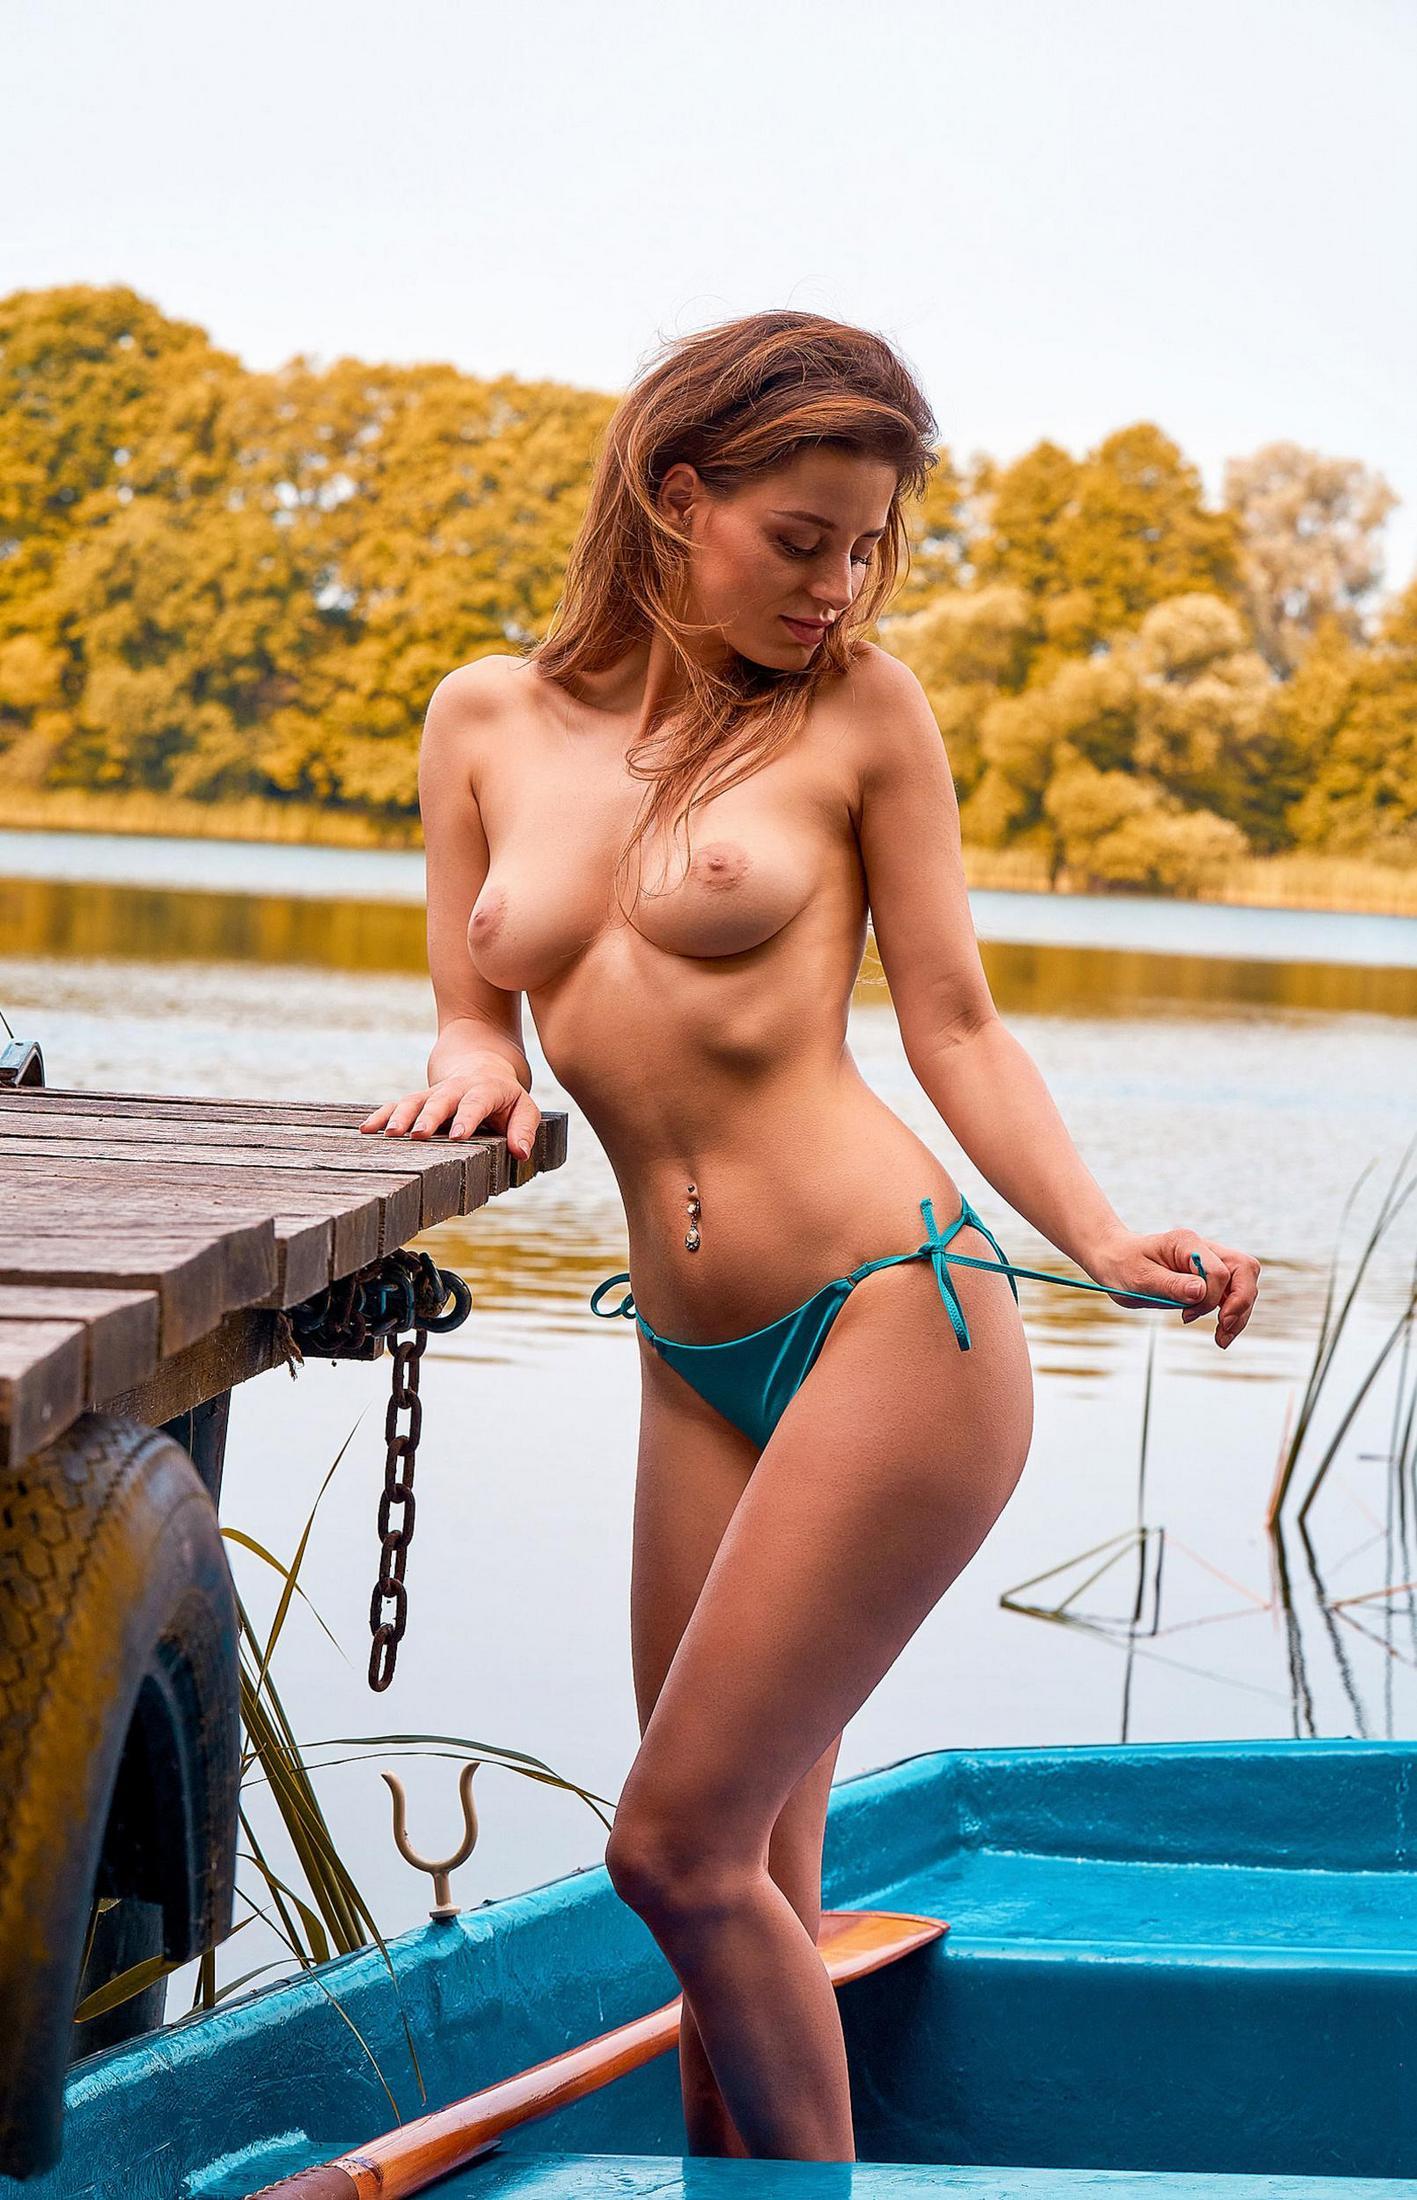 Jeany Waldheim - Simon Bolz photoshoot